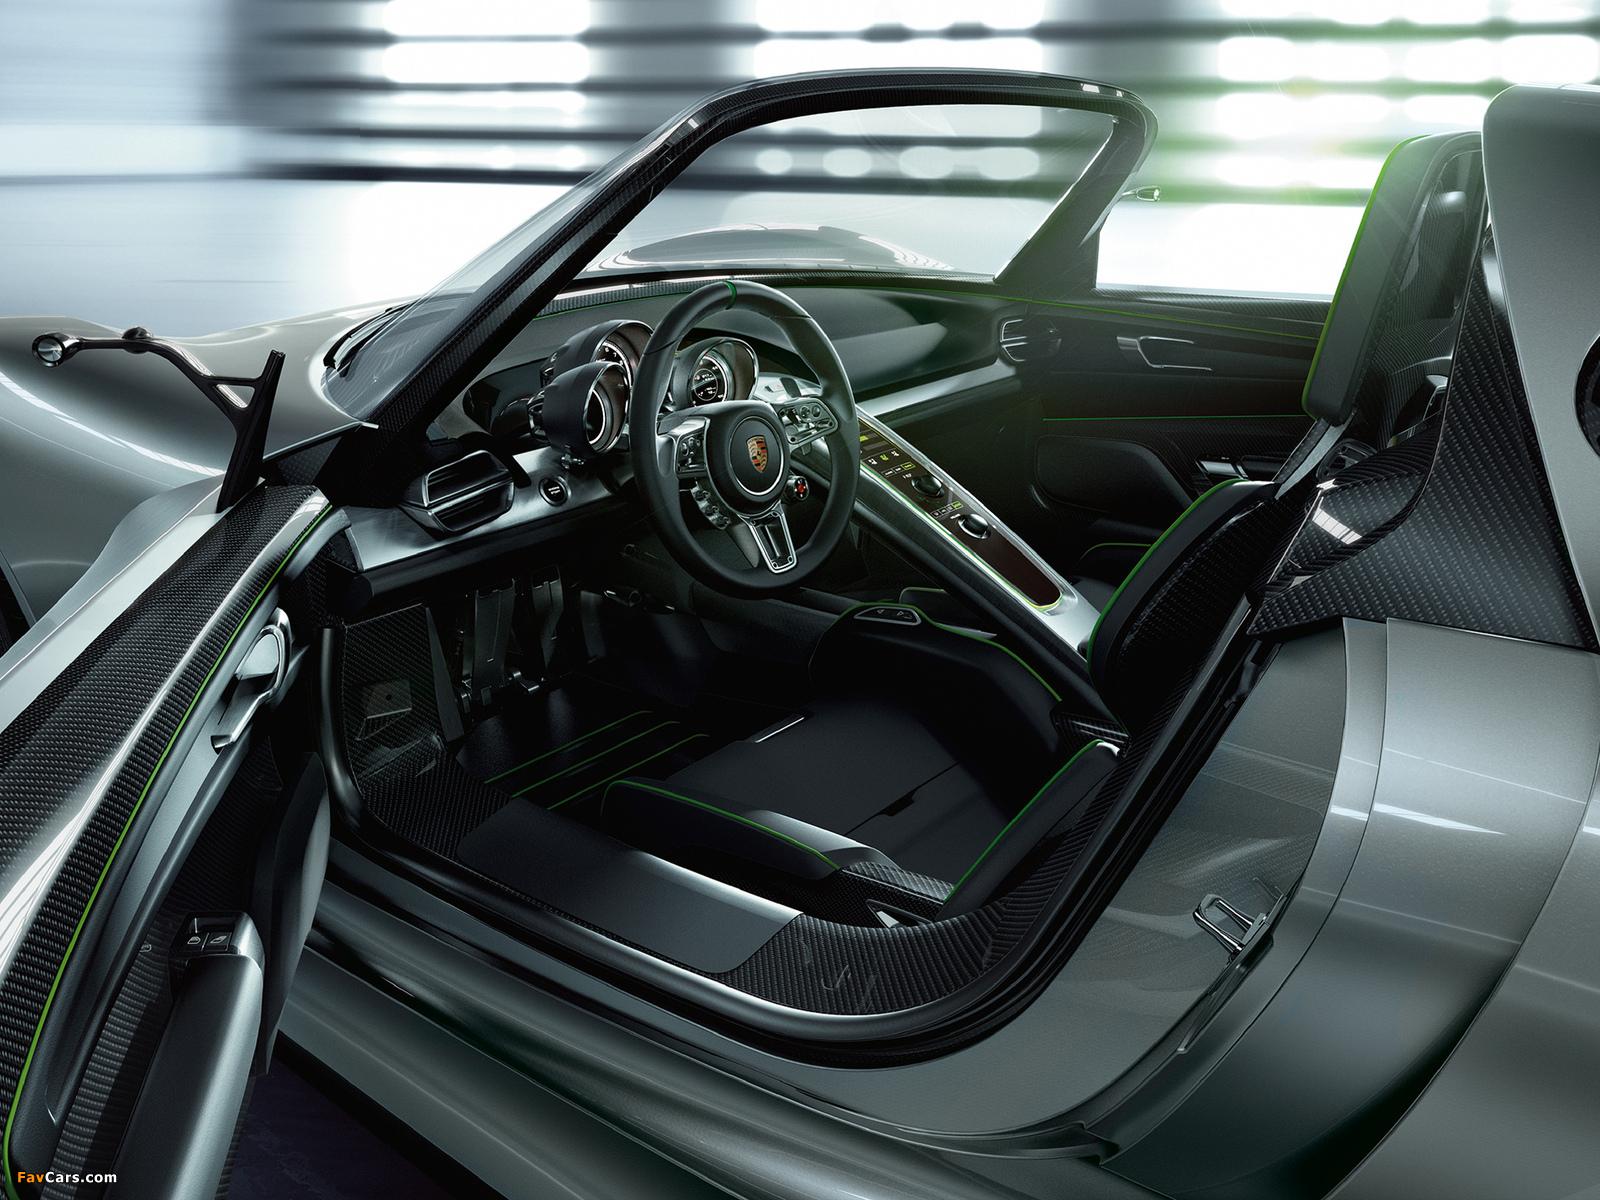 Porsche 918 Spyder Concept 2010 pictures (1600 x 1200)